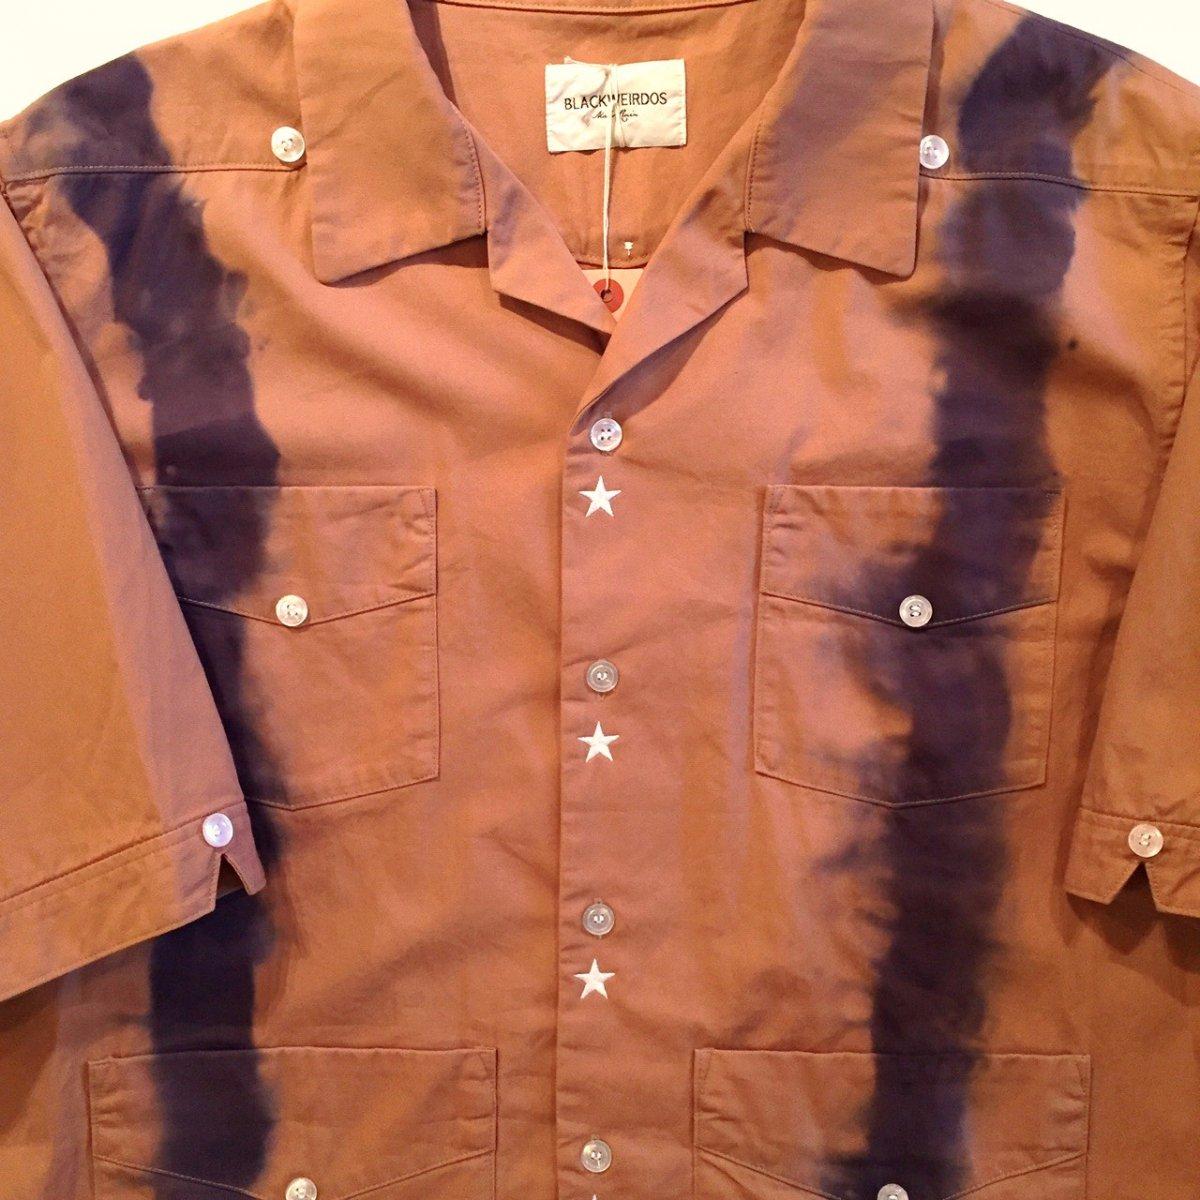 <img class='new_mark_img1' src='https://img.shop-pro.jp/img/new/icons3.gif' style='border:none;display:inline;margin:0px;padding:0px;width:auto;' />Black weirdos  ブラック ウィドー / 半袖シャツ TieDye Cuba Shirt 【BROWN】